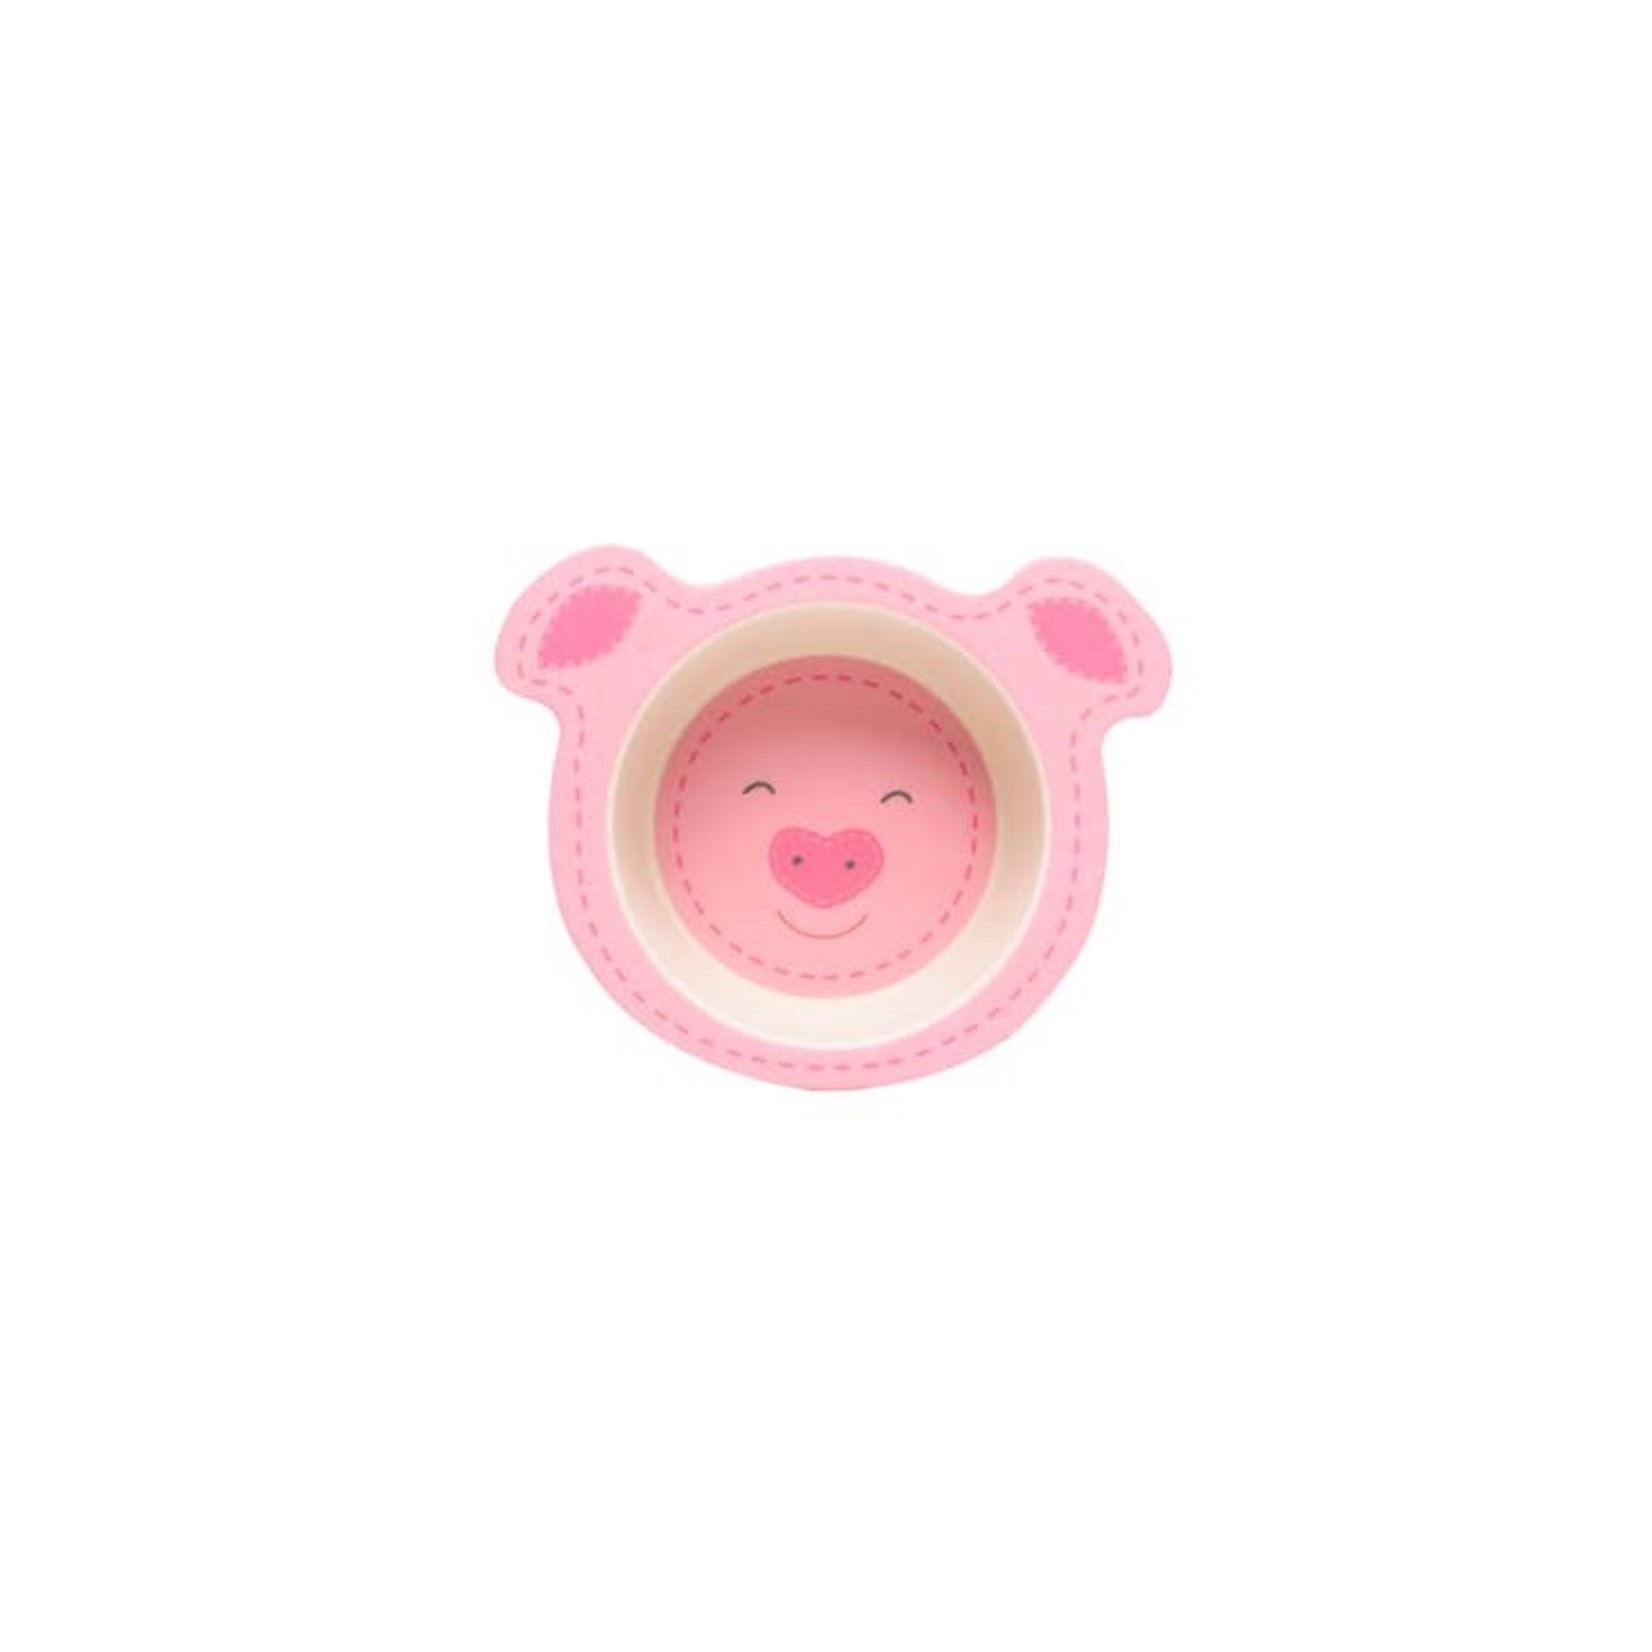 BAMBOOZLE HOME PENELOPE PIG BOWL